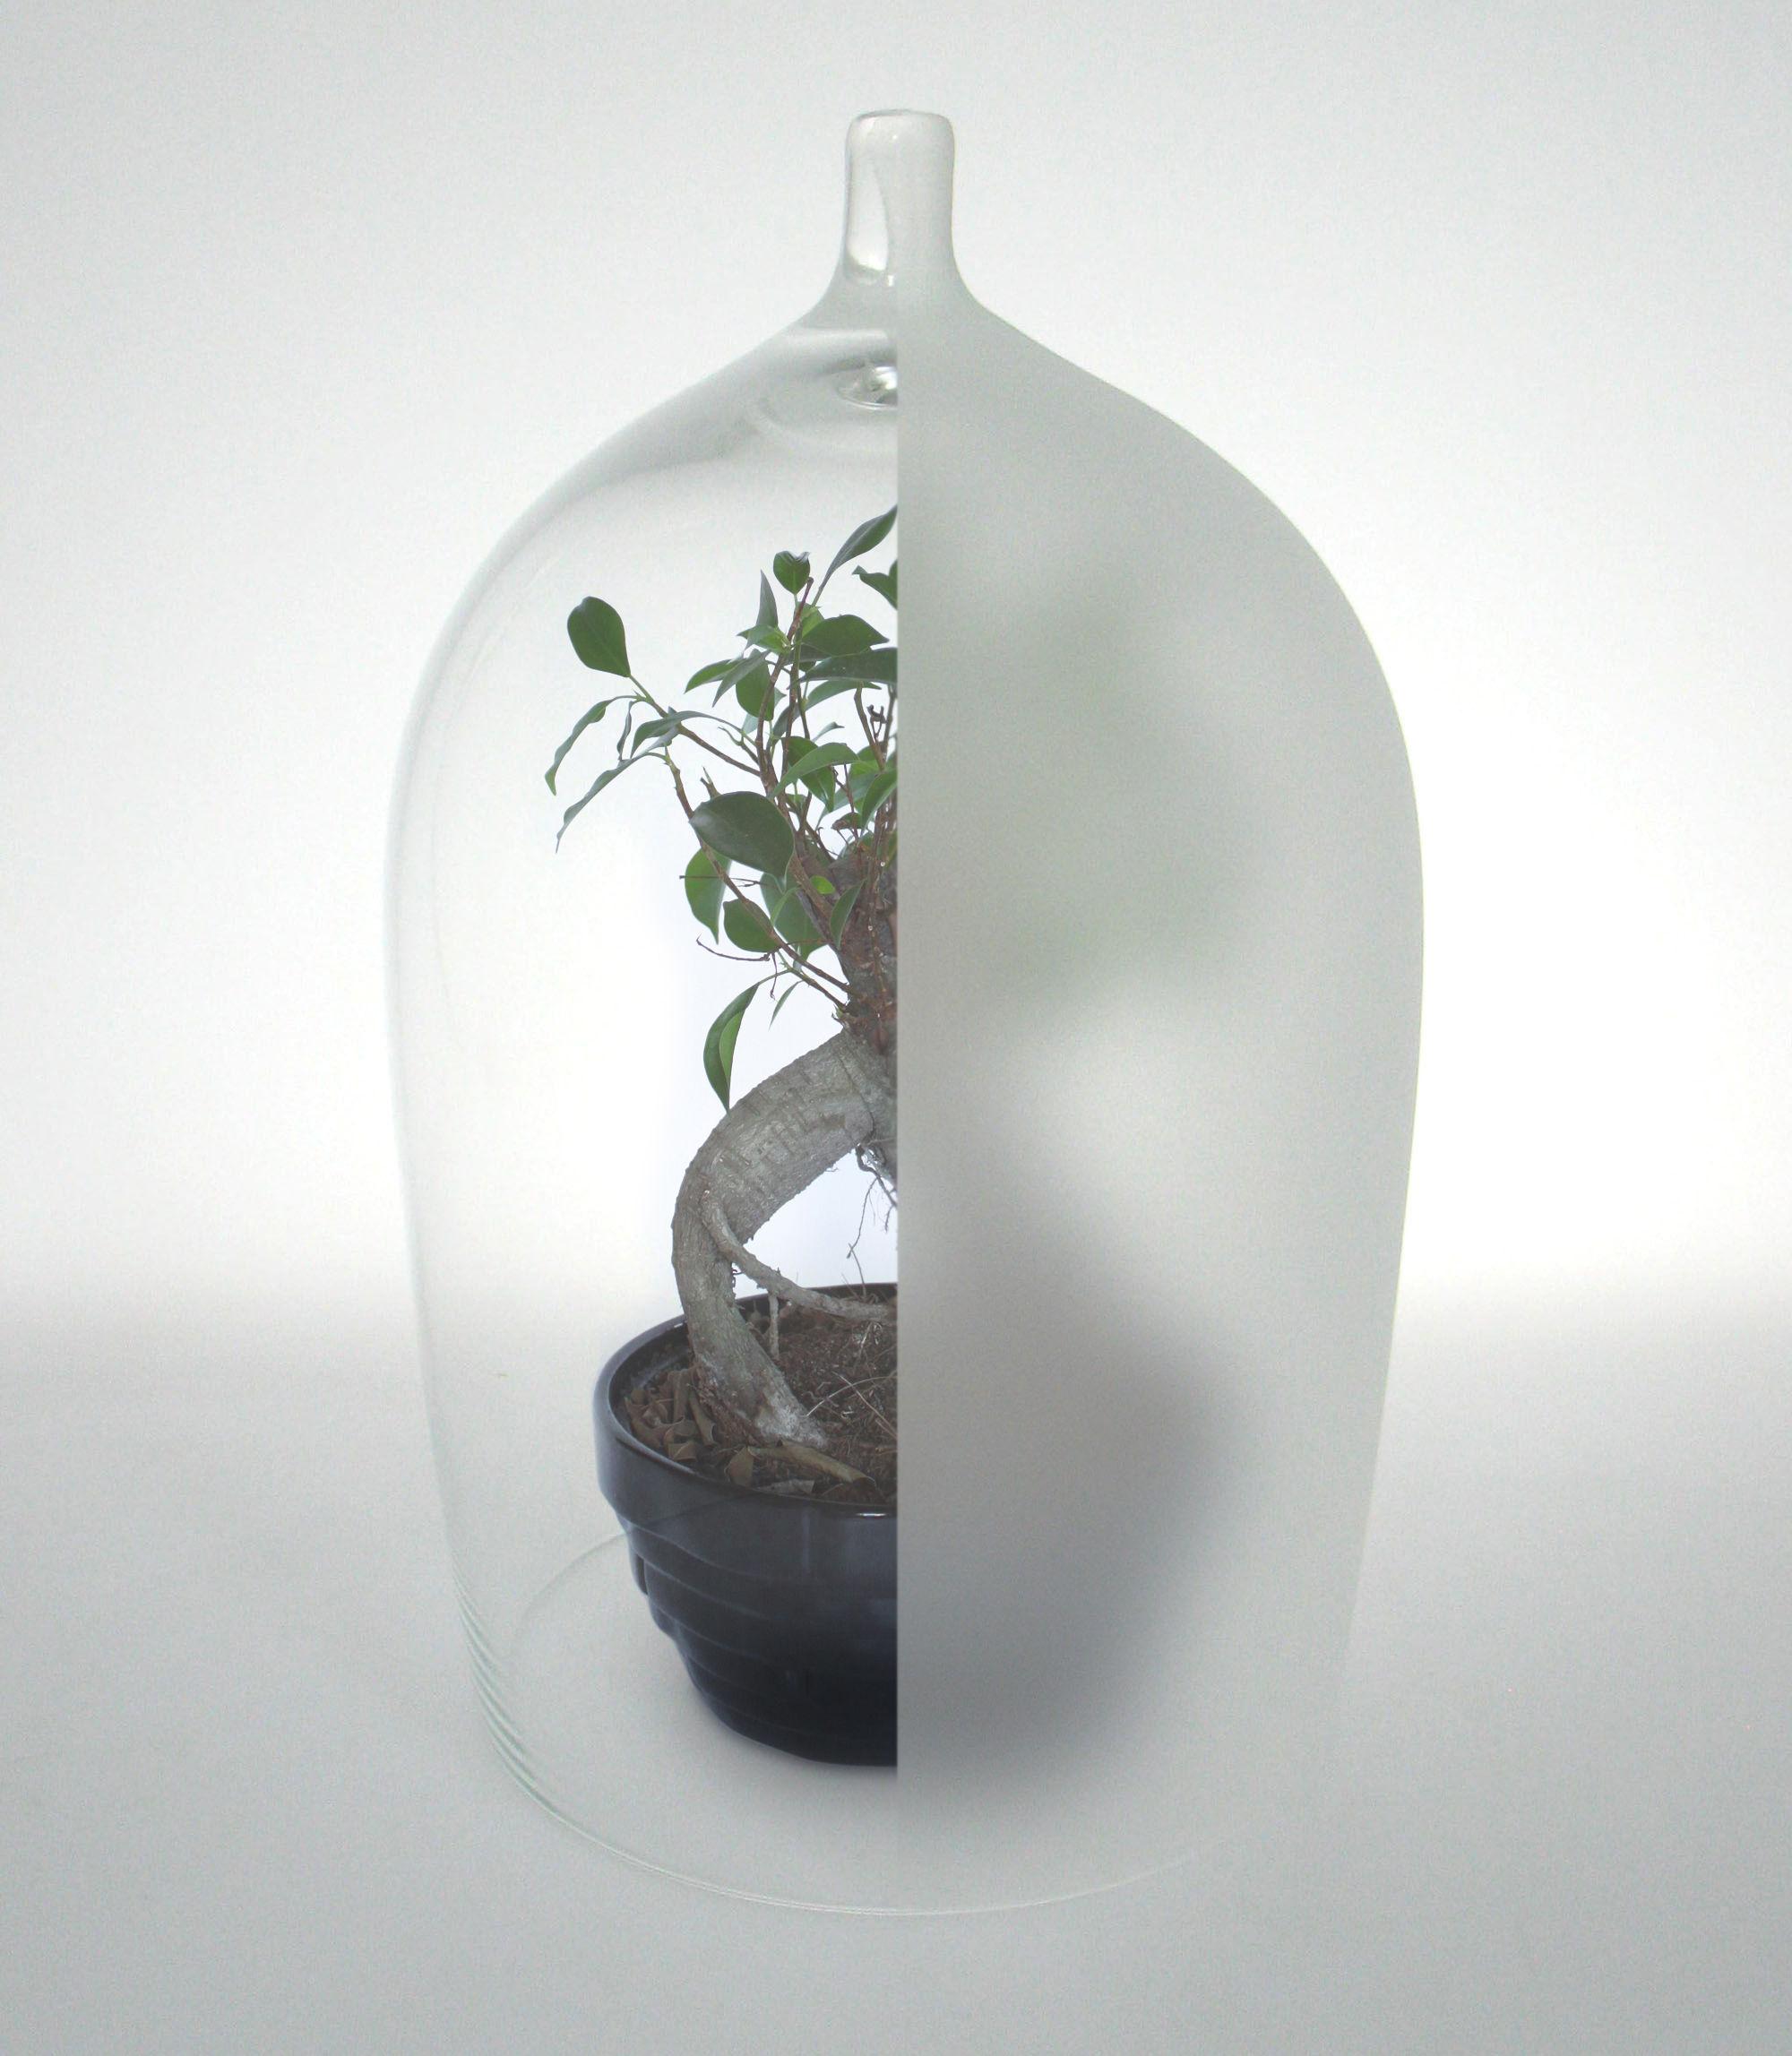 Decoration - Home Accessories - Nippy S Showcase - Piergil Fourquié - Iconic Serie by Designerbox - Transparent / Translucent - Blown glass